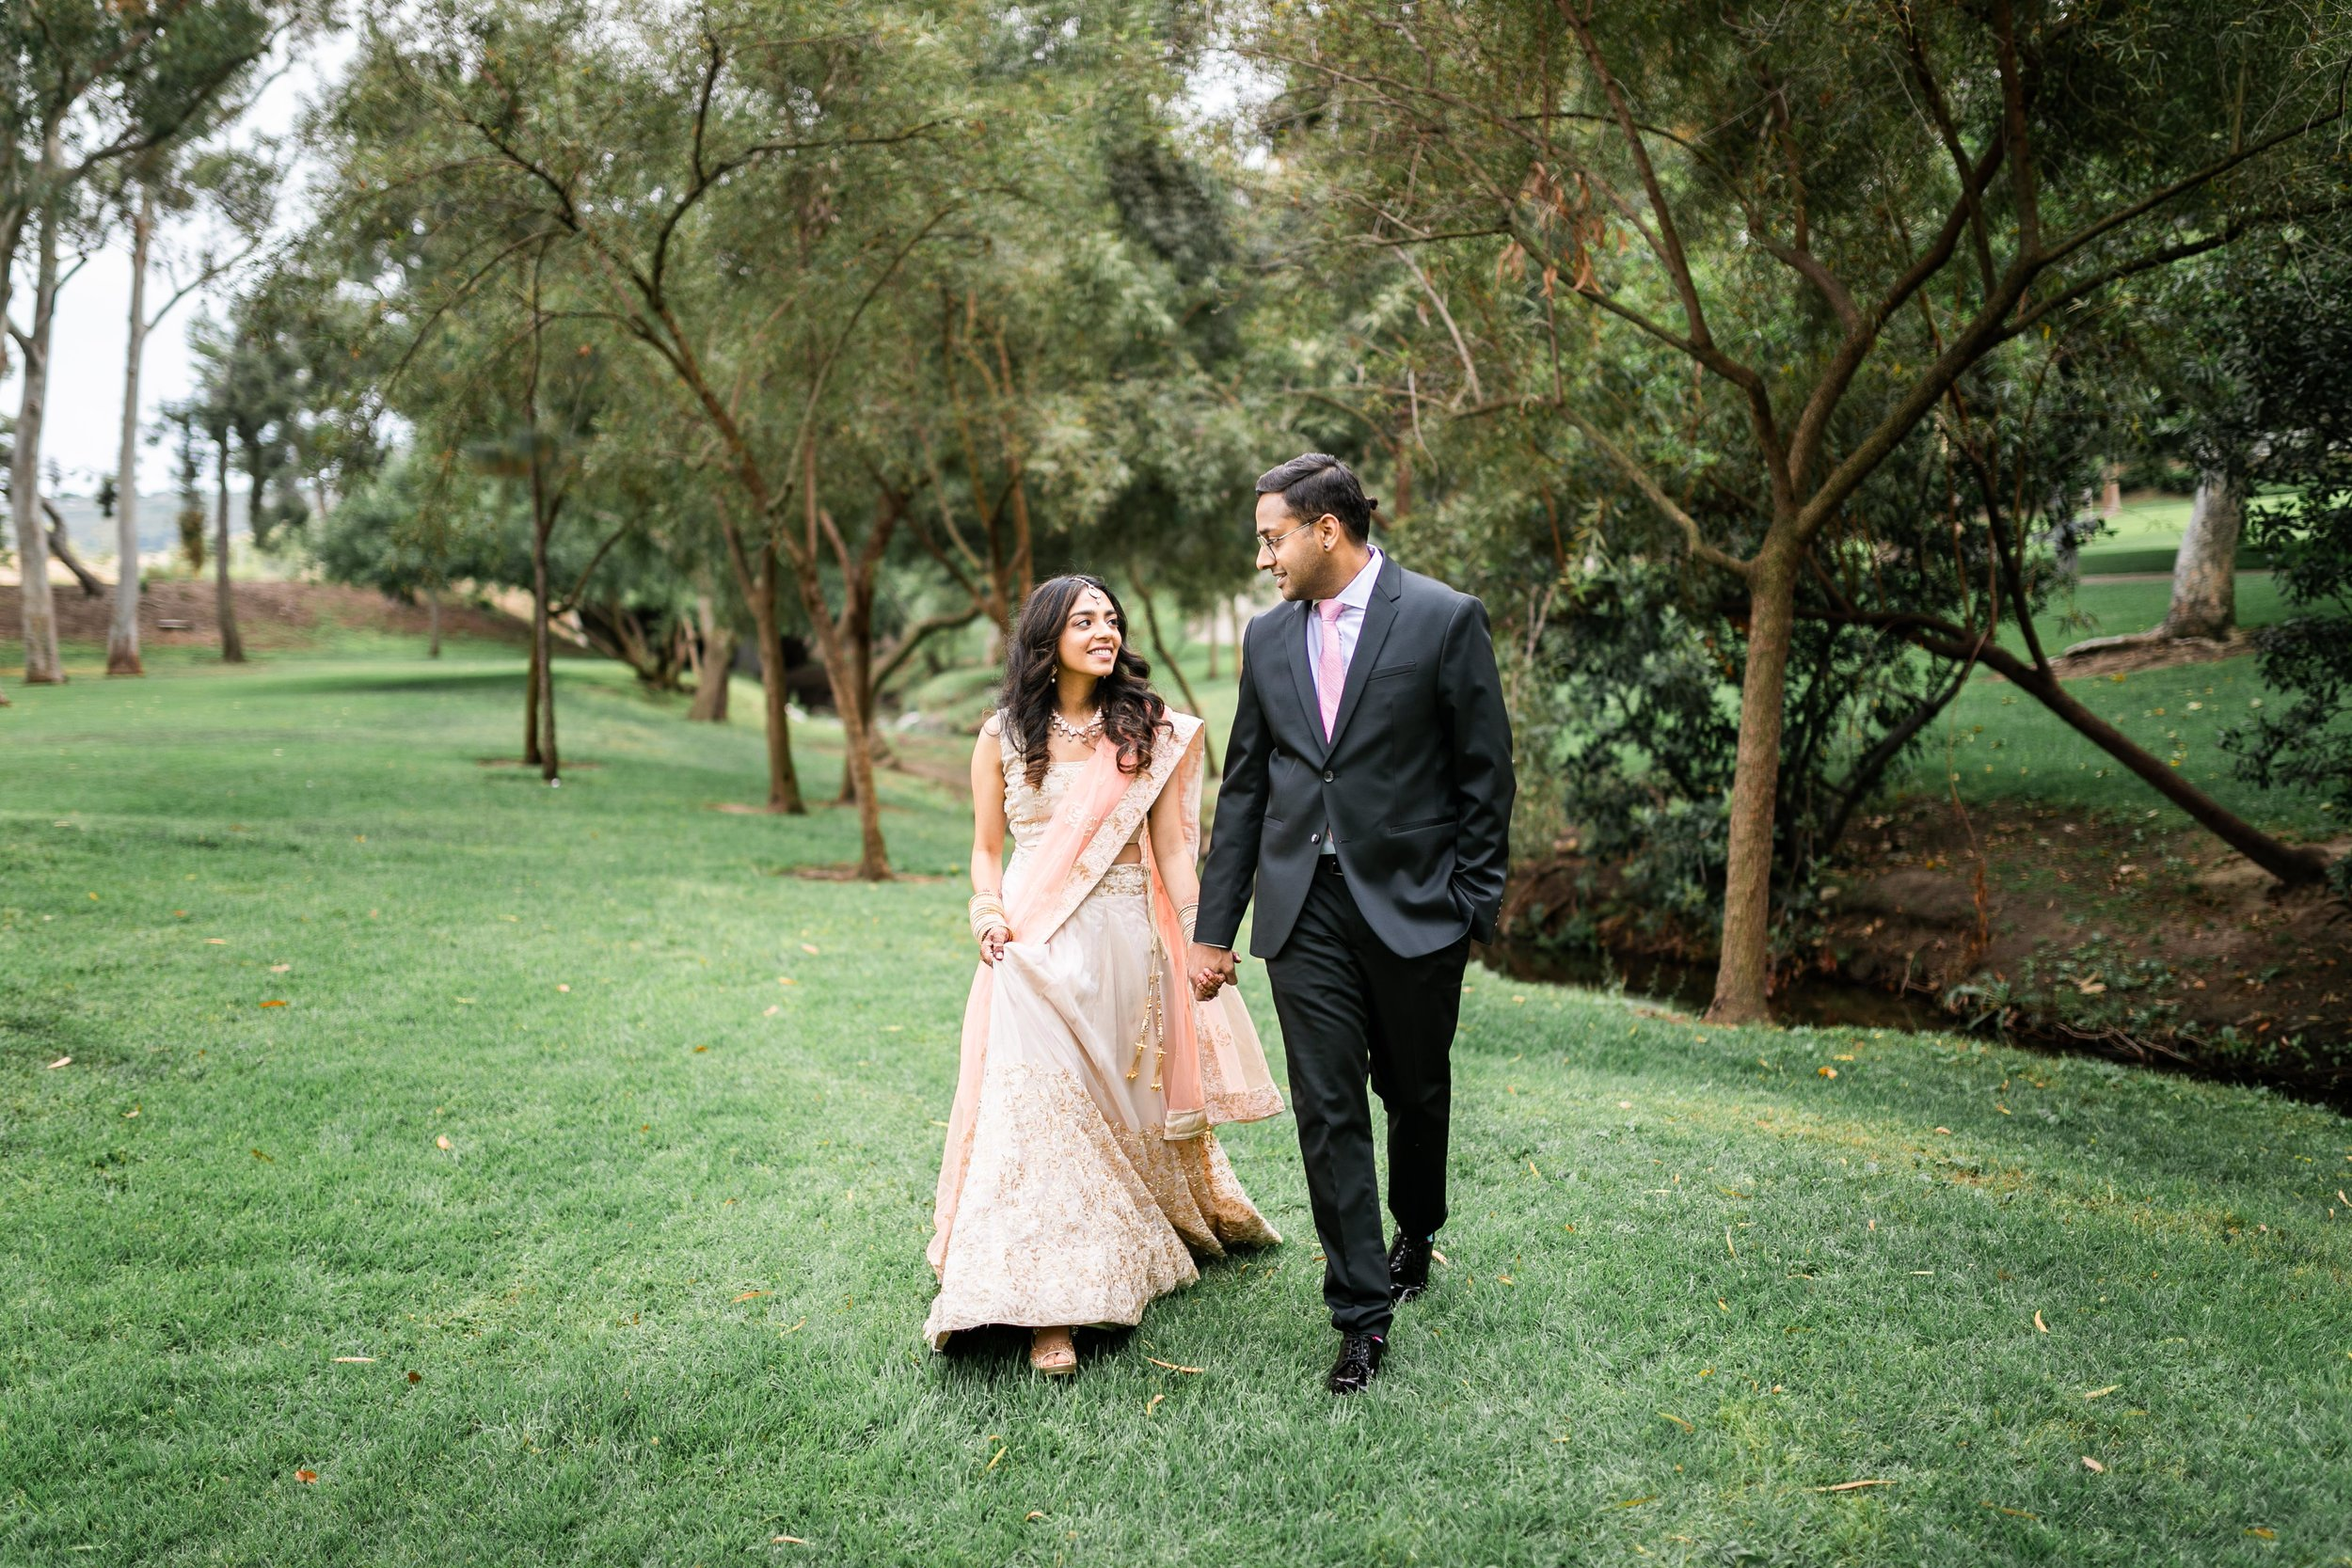 indian_ reception_southern_california_wedding_joshuachun_photography-4.JPG